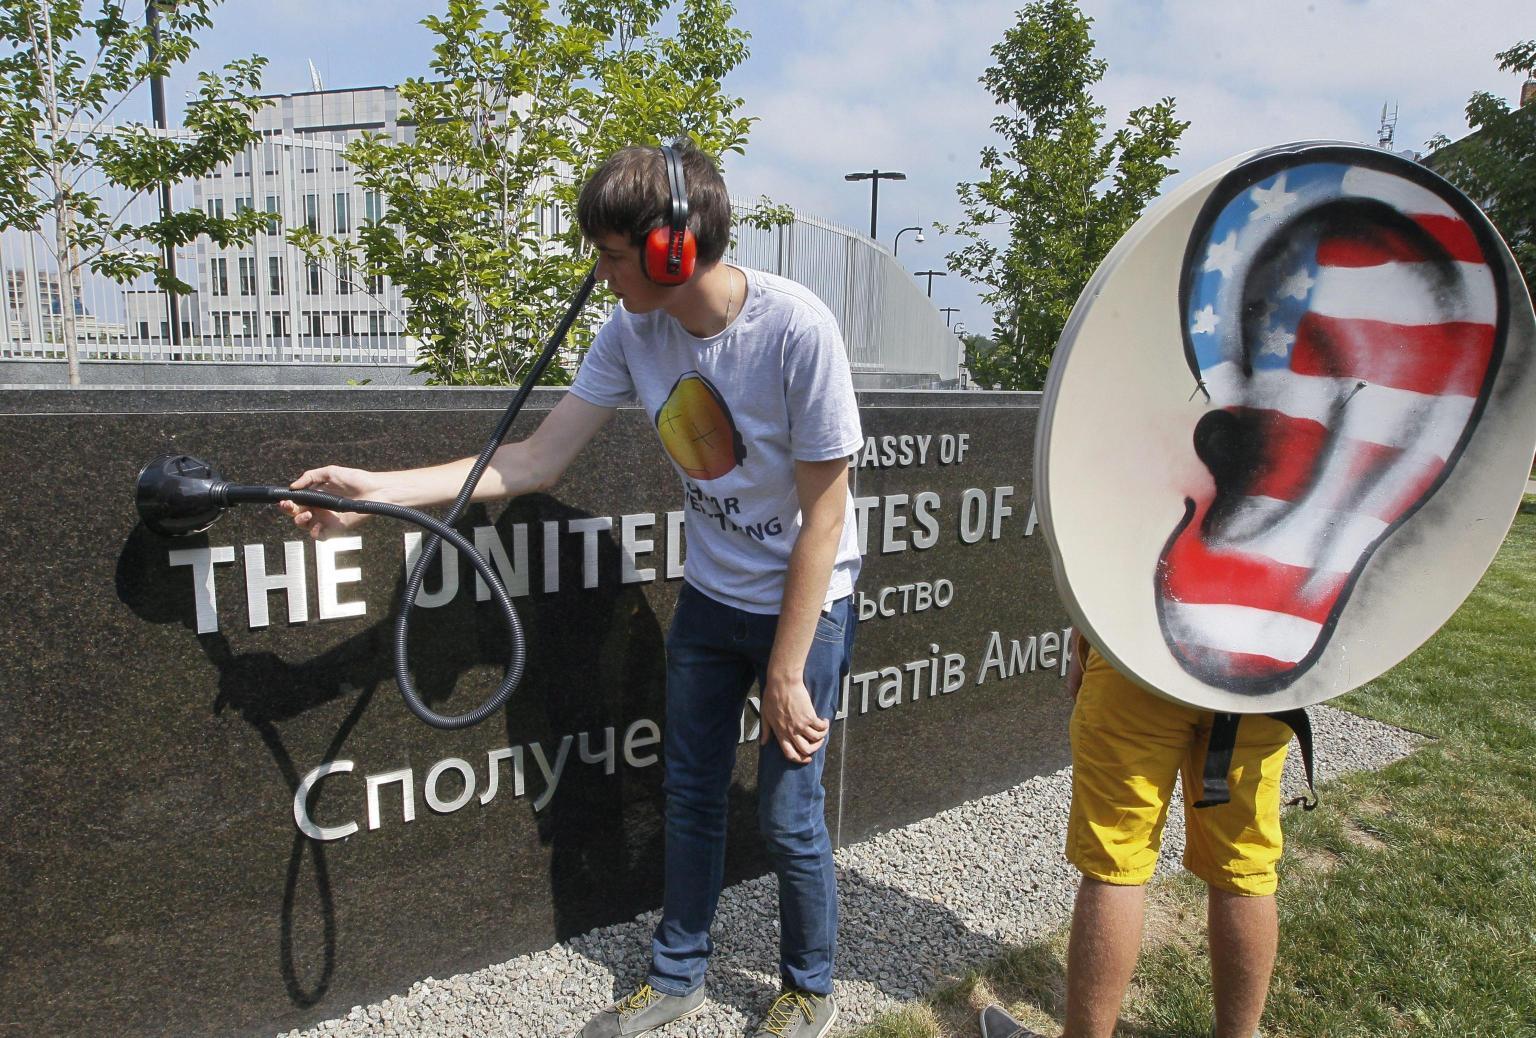 Datagate: Angela Merkel veniva spiata da anni. Washington grida: 'stop watching Usa'